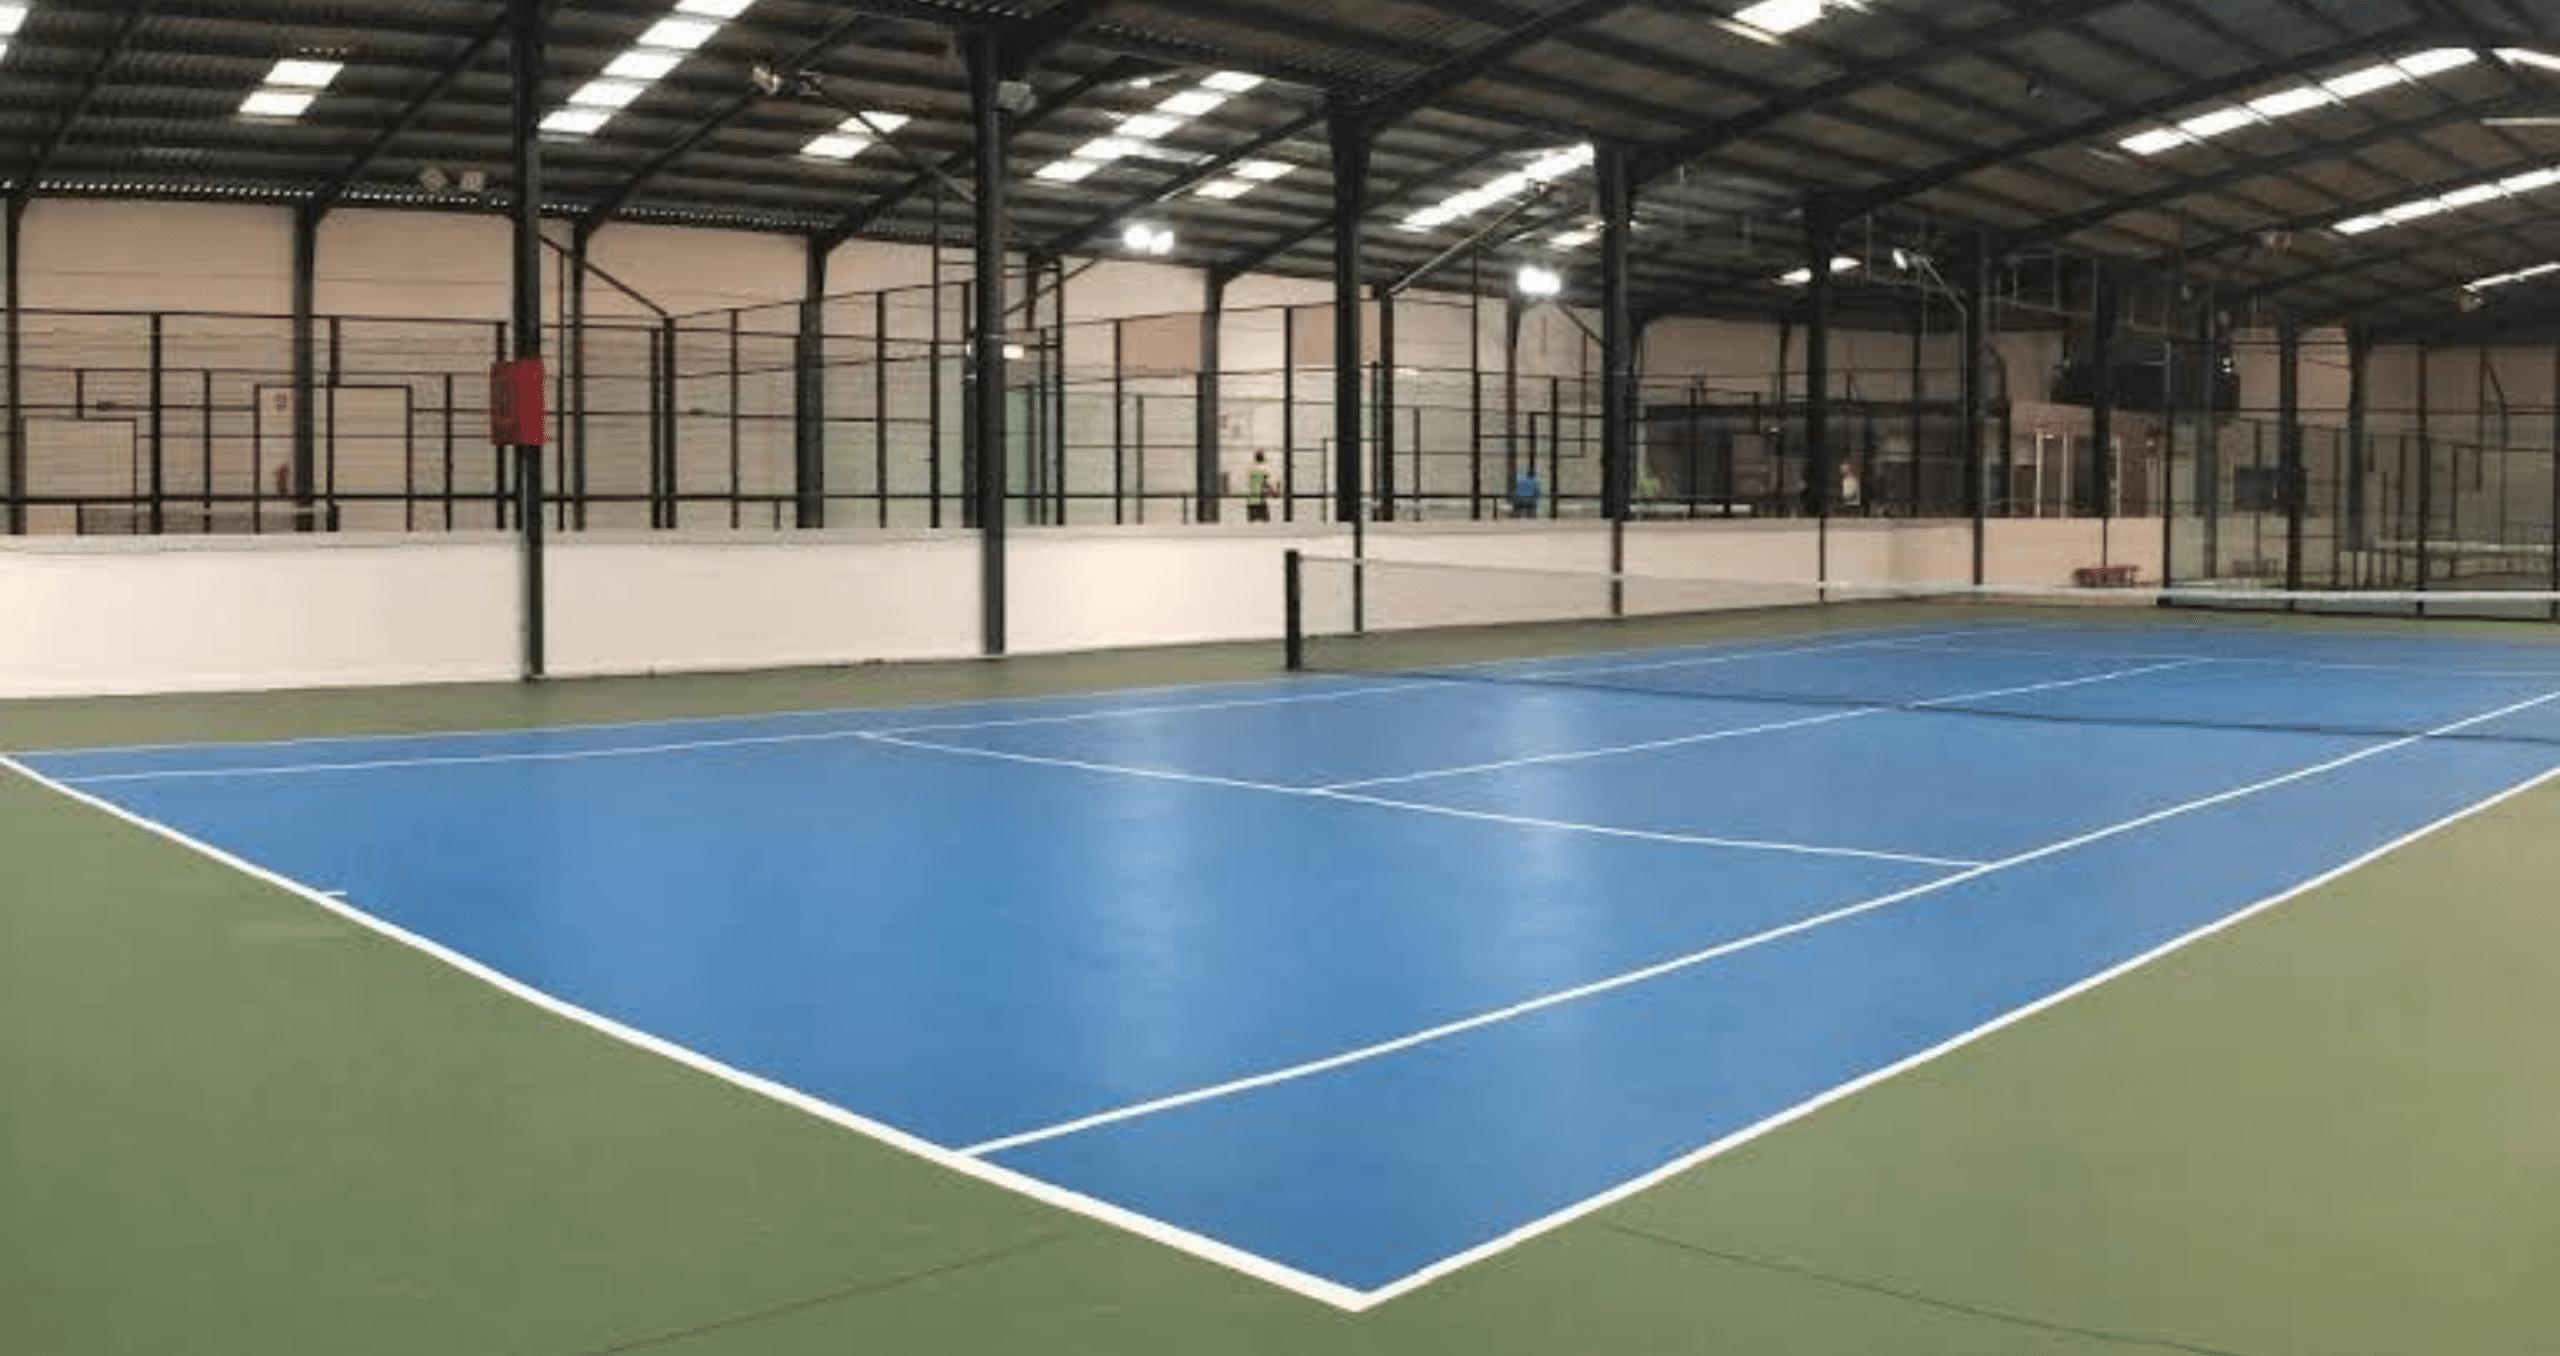 clases de tenis plasencia